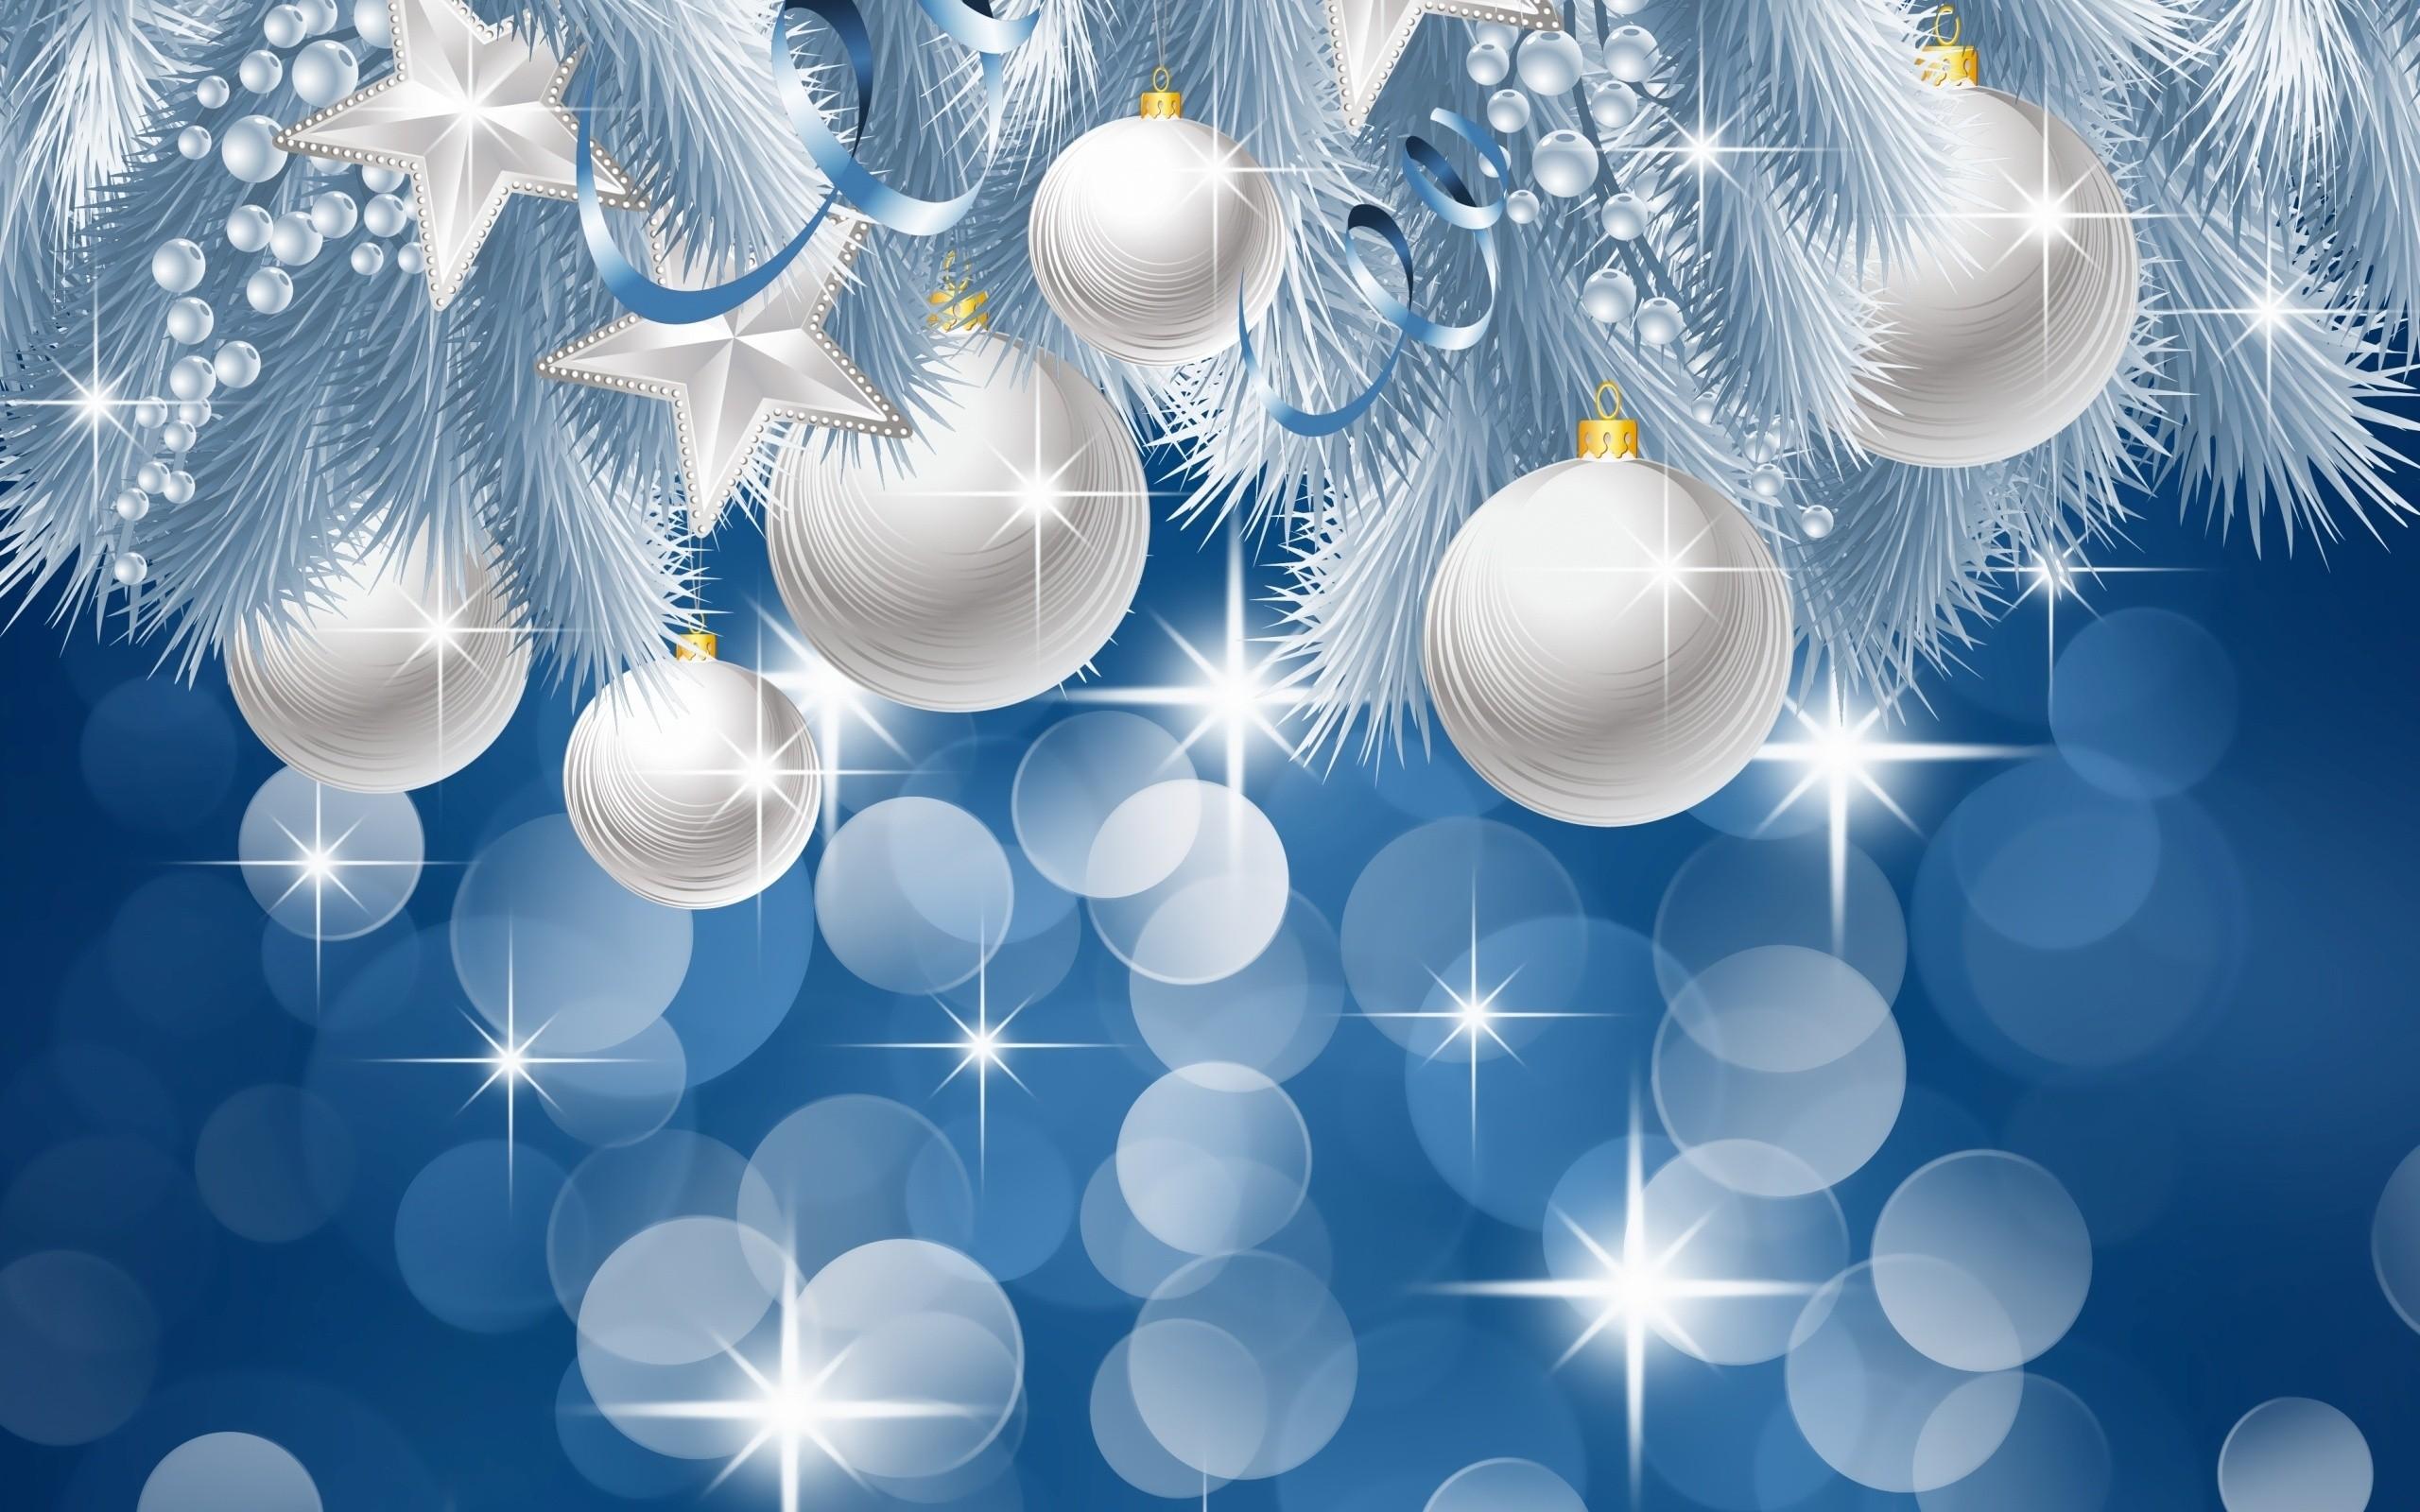 Hintergrundbilder : Illustration, Kugel, Ast, blau, Muster ...